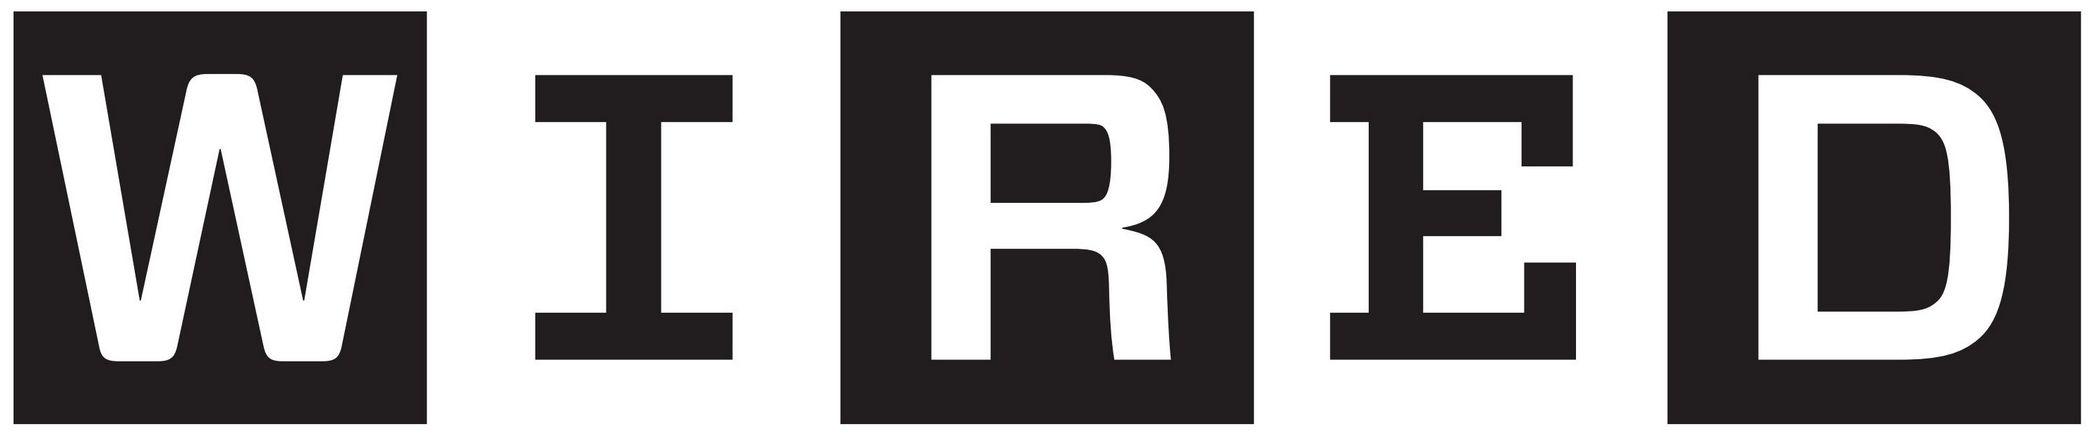 Wired Logo Online Book Club Wired Magazine Logos